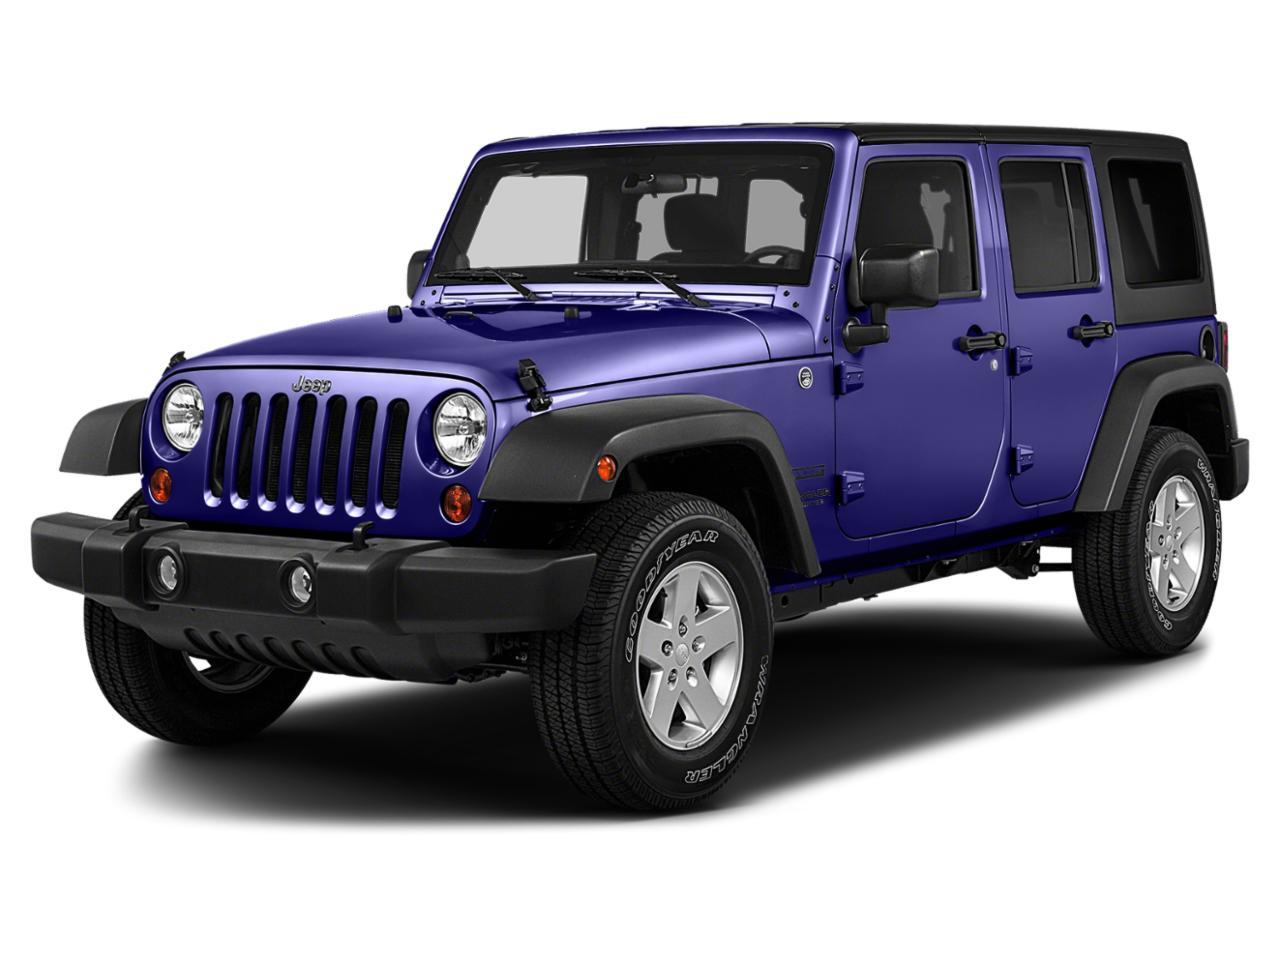 2018 Jeep Wrangler JK Unlimited Vehicle Photo in SMYRNA, GA 30080-7631